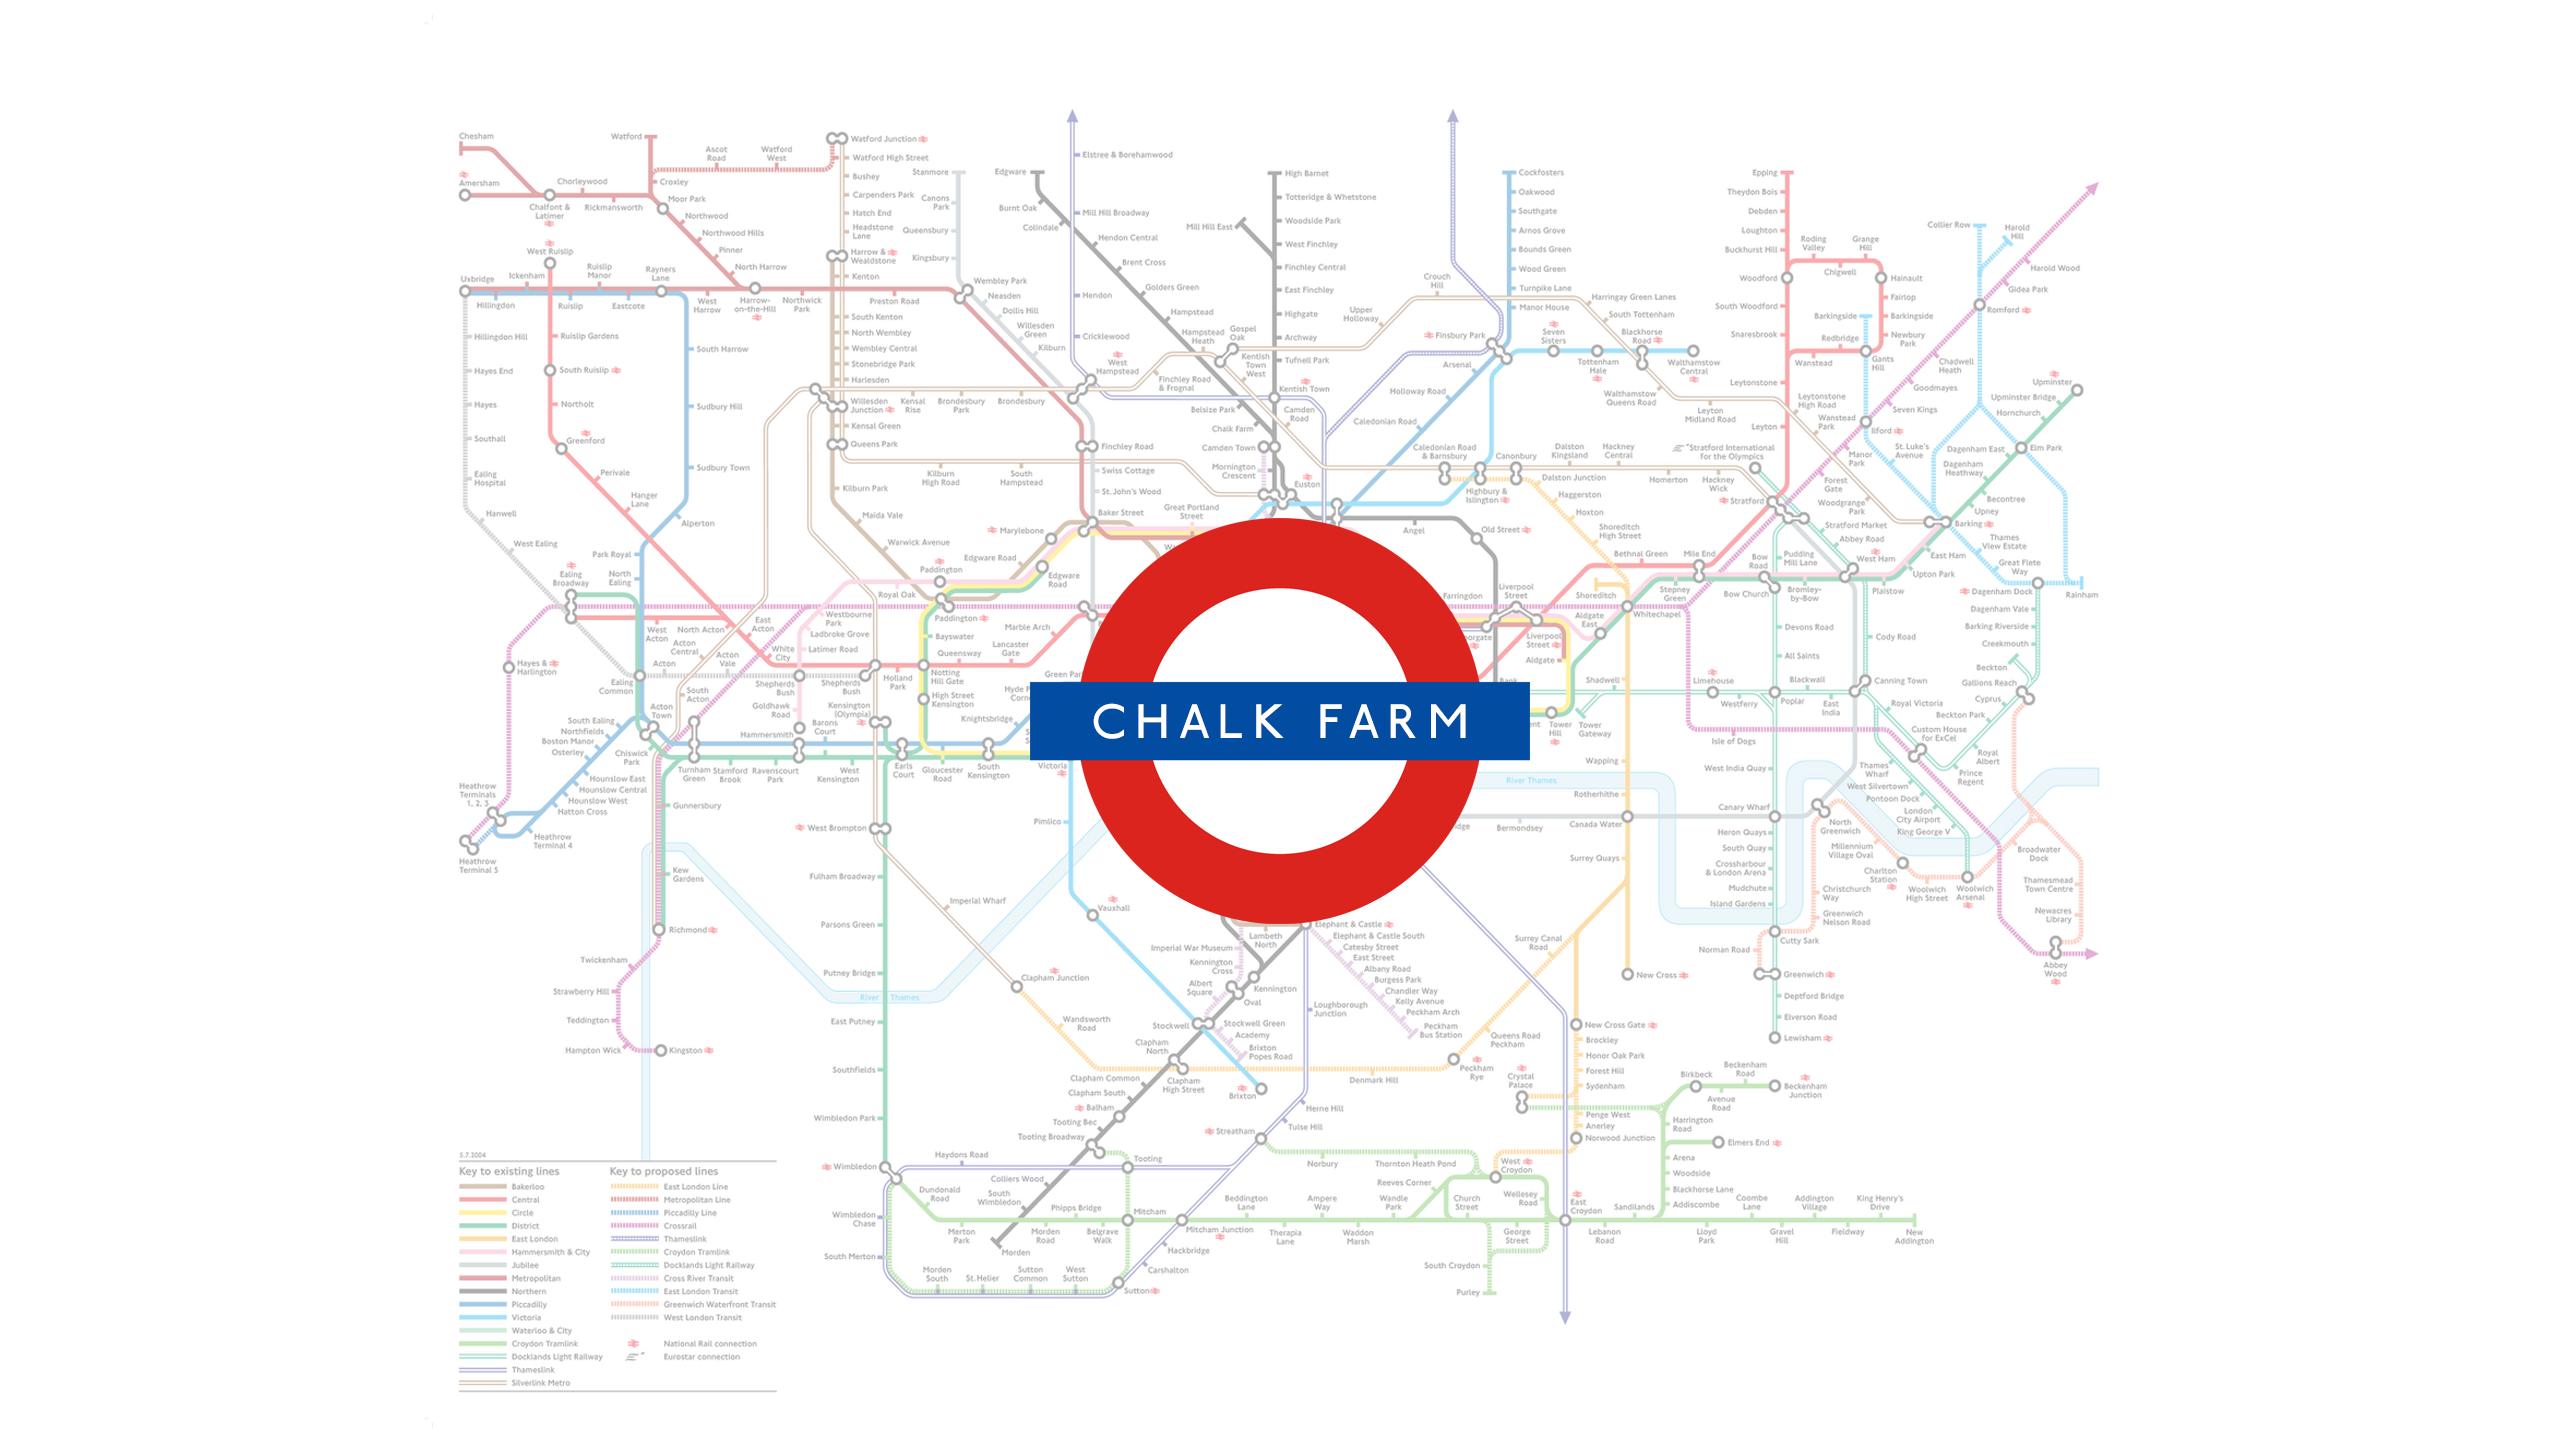 Chalk Farm (Map)